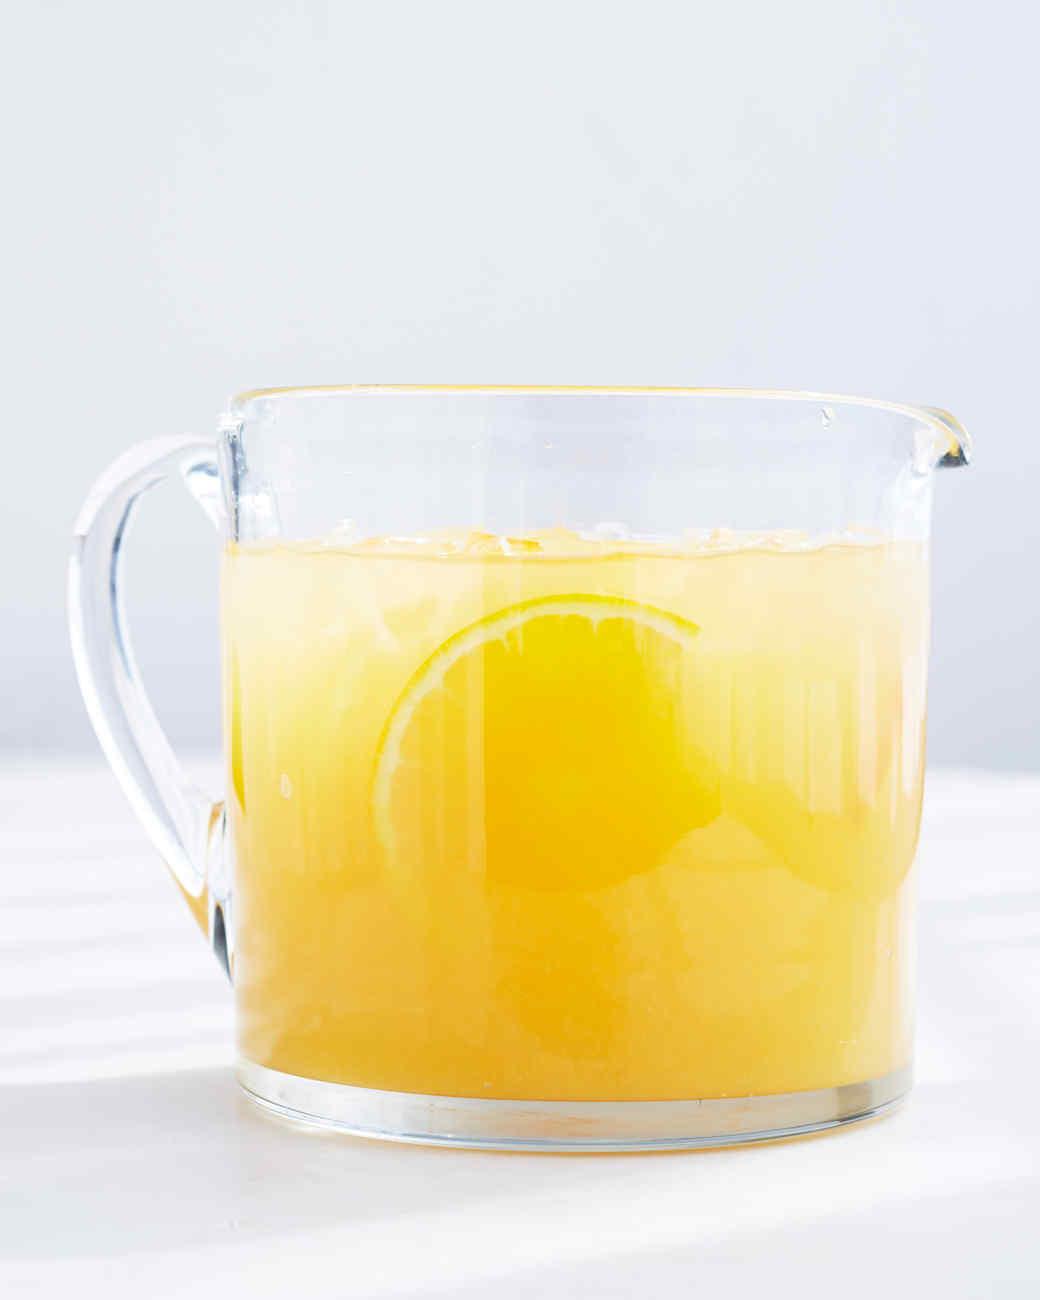 jasmine-orange-juice-0228-d111106-0614.jpg